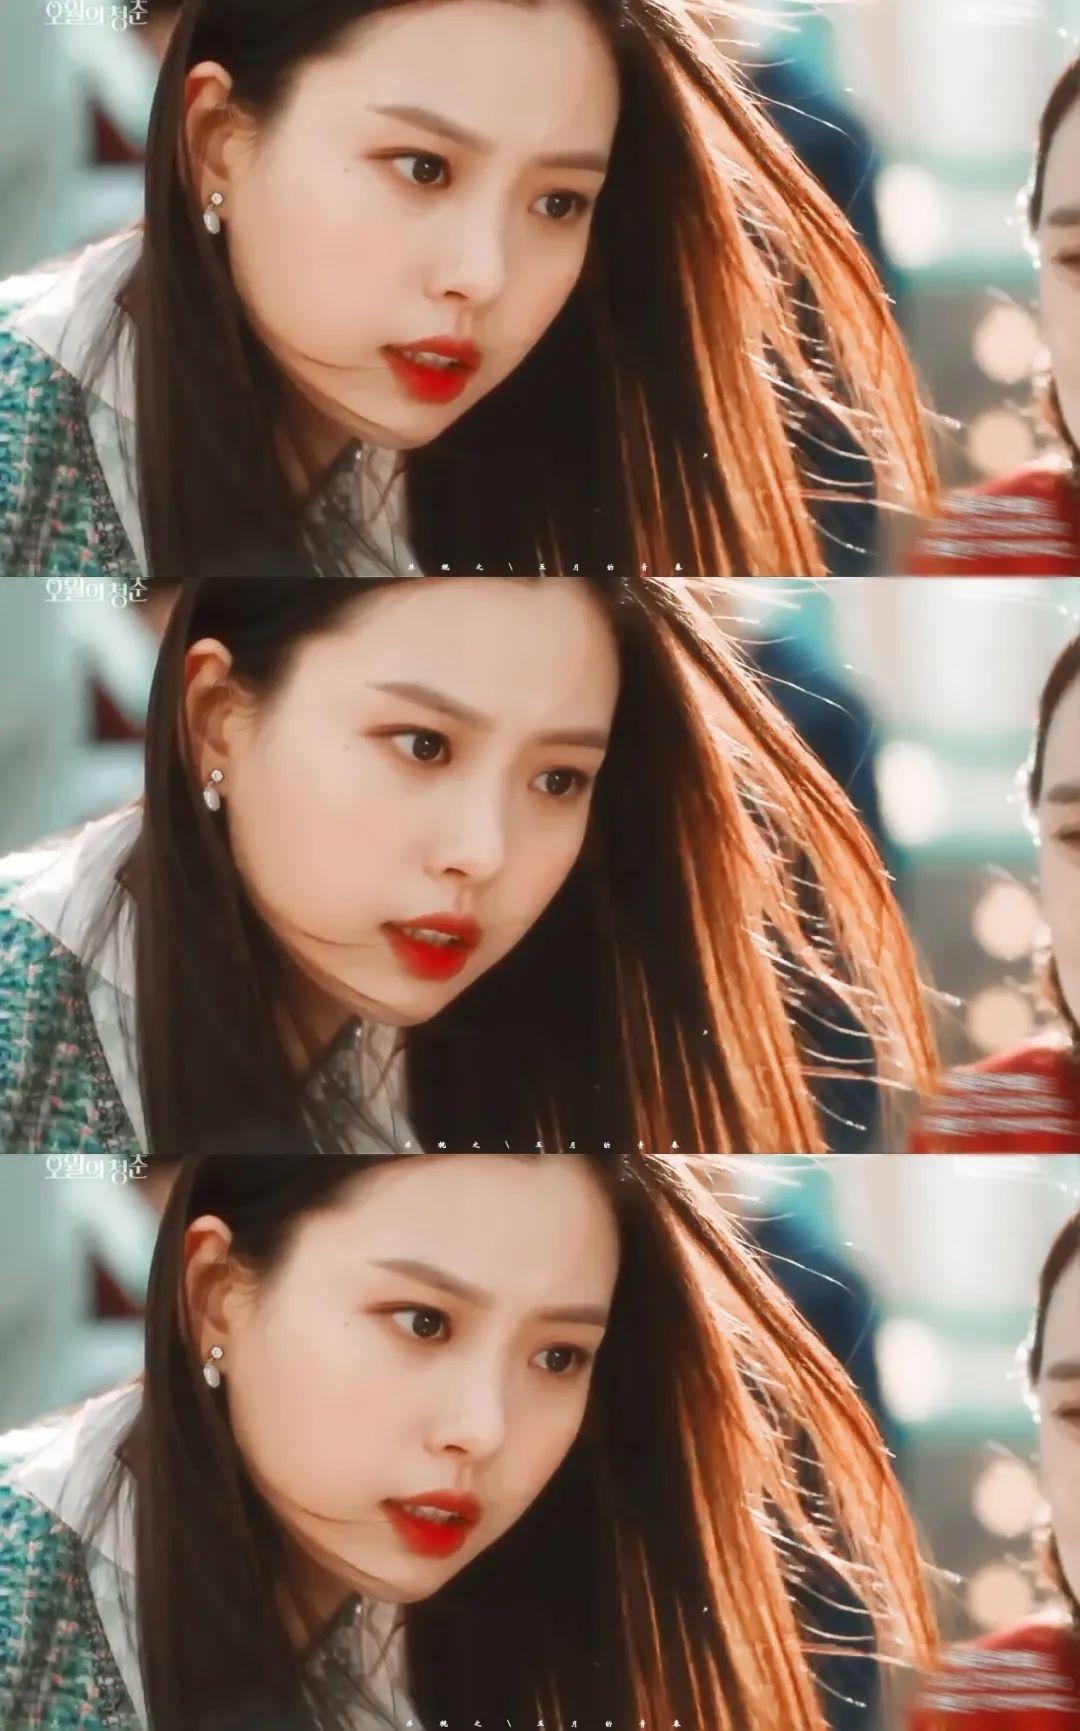 Face bump Kim min hee Korean drama atmosphere beauty + 1插图7